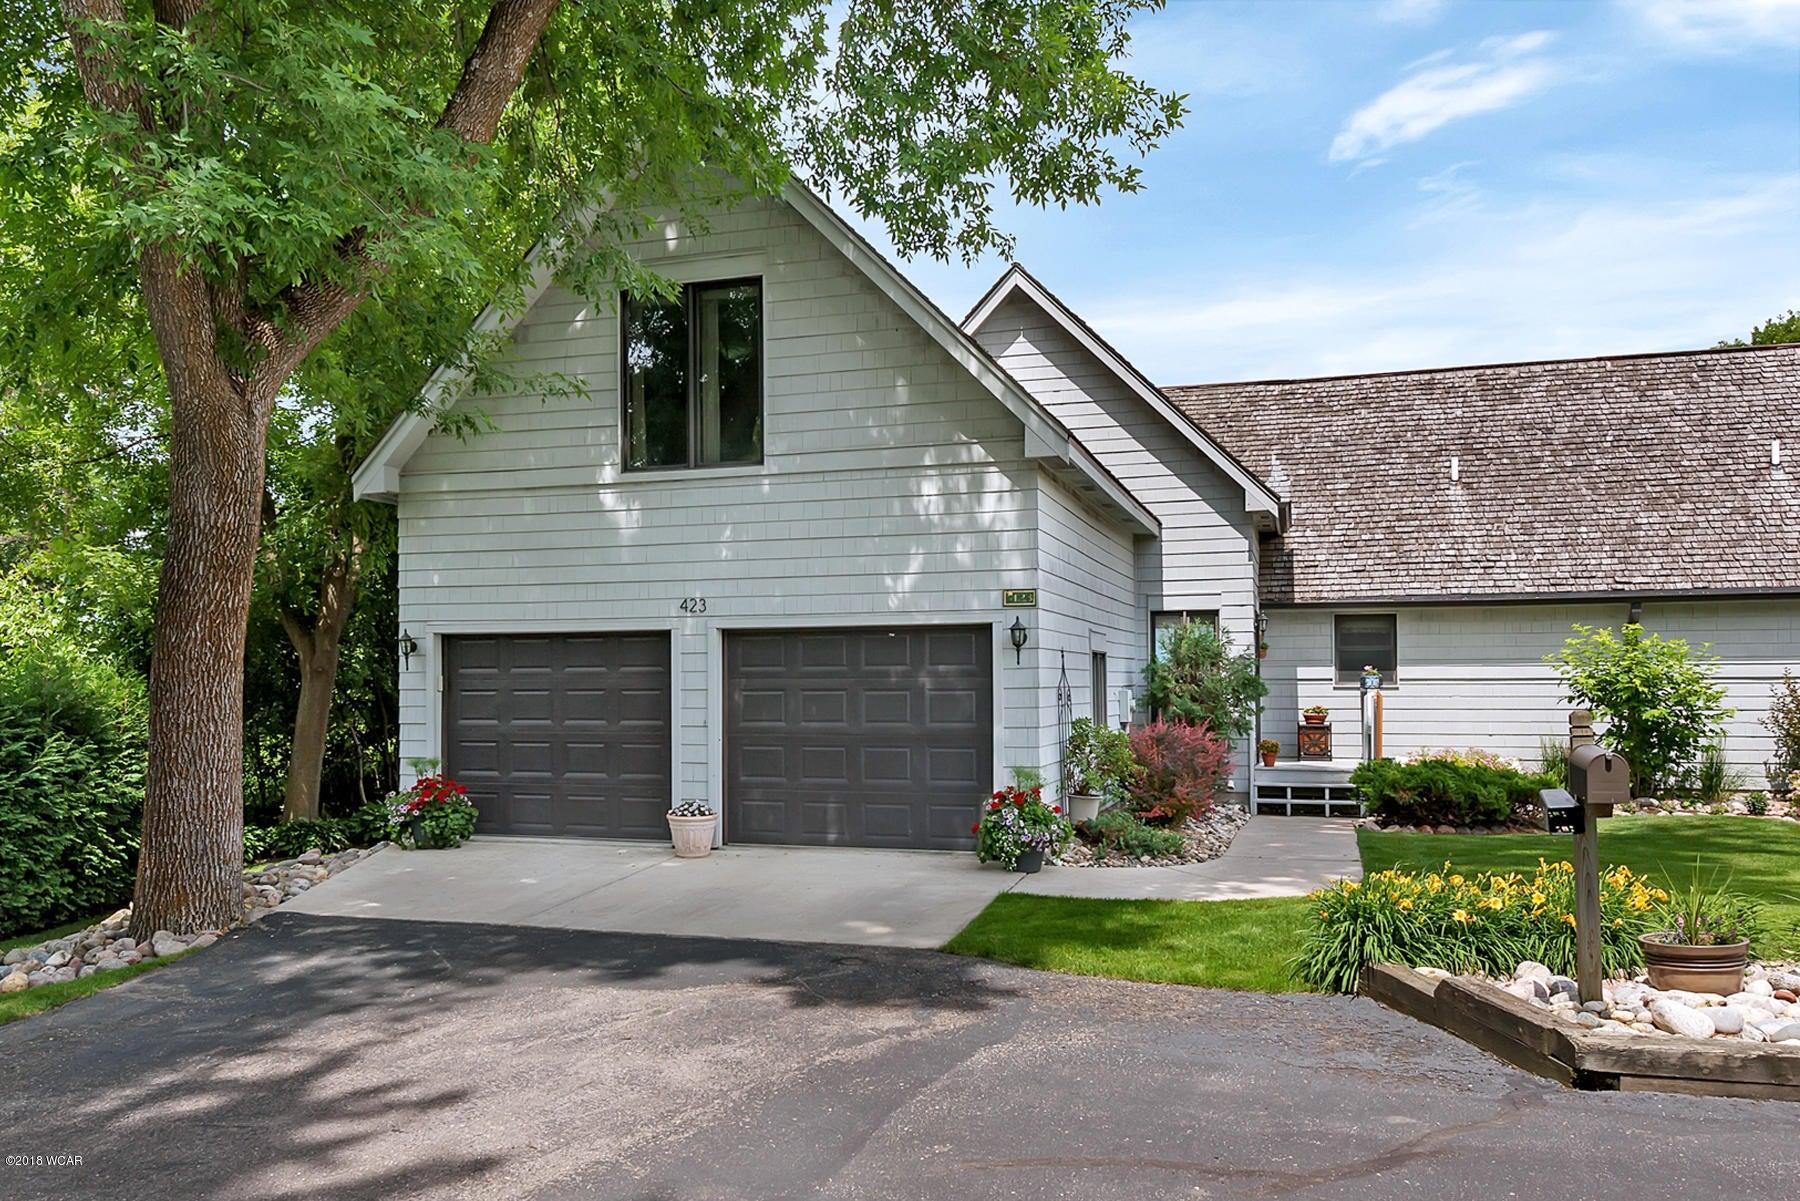 423 Lake Avenue,Spicer,4 Bedrooms Bedrooms,3 BathroomsBathrooms,Single Family,Lake Avenue,6031241